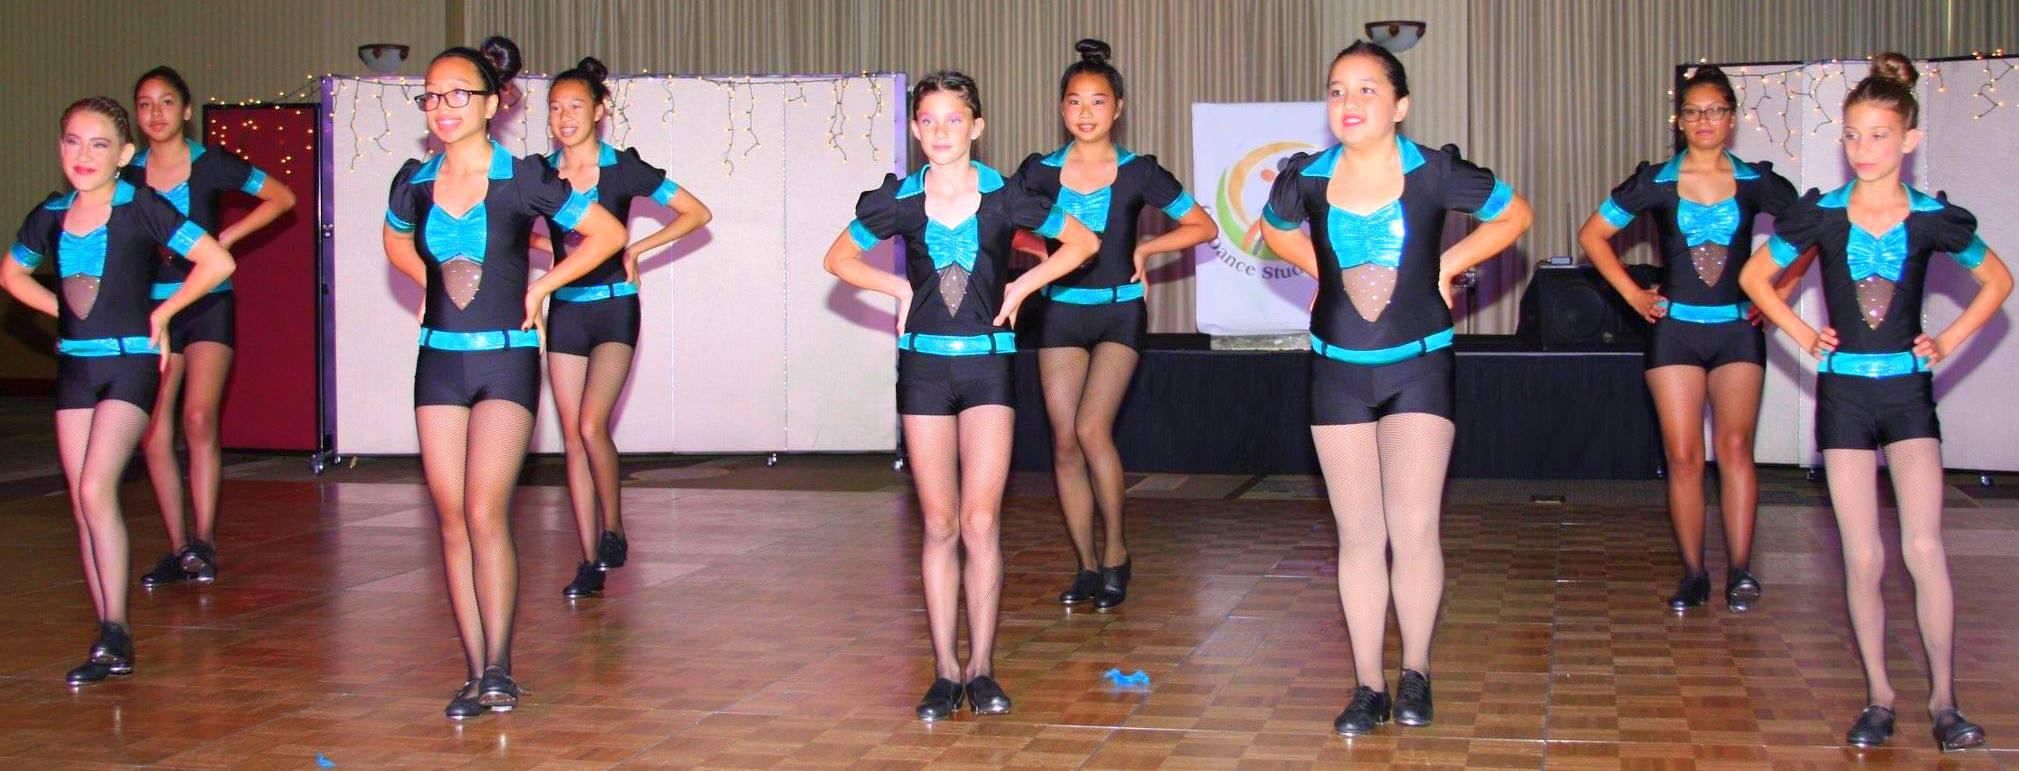 Kids dance studio in orange county